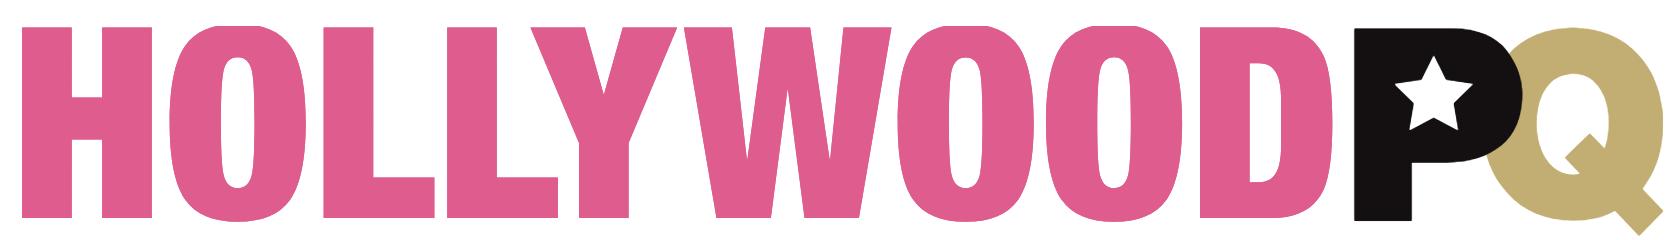 Logo hollywoodpq.com